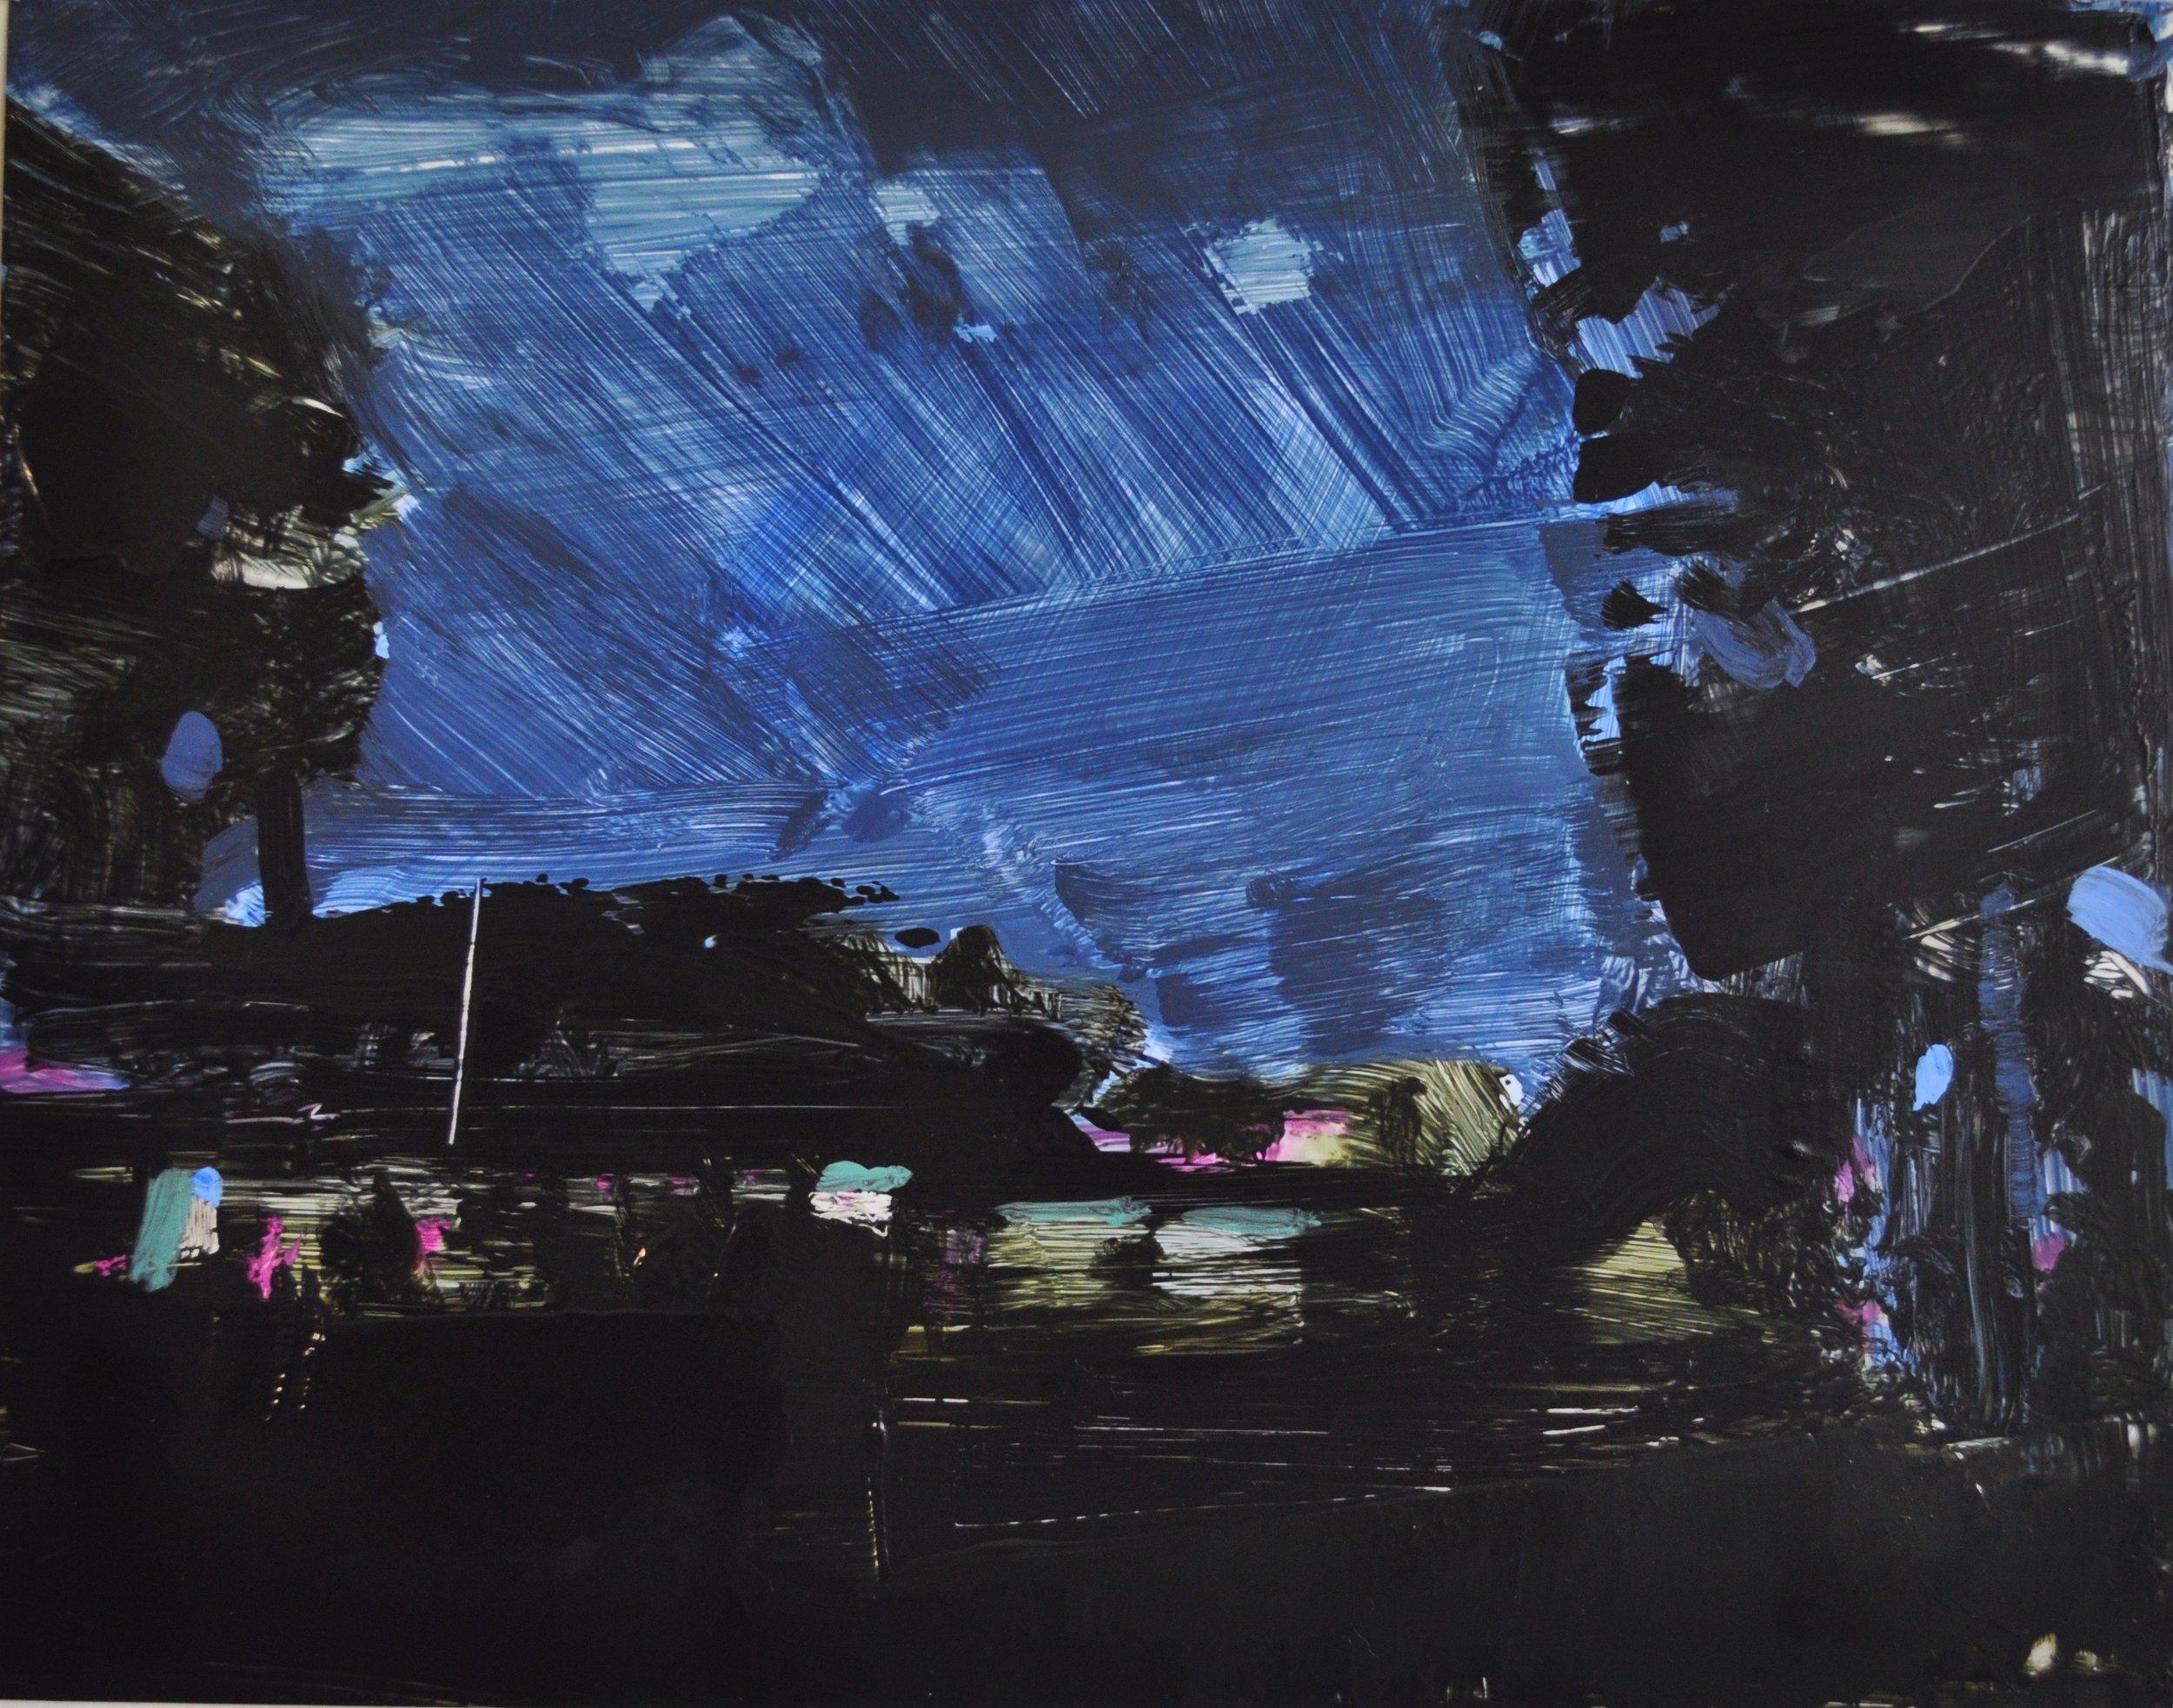 Night Scape Over Park, Jesse Thomas